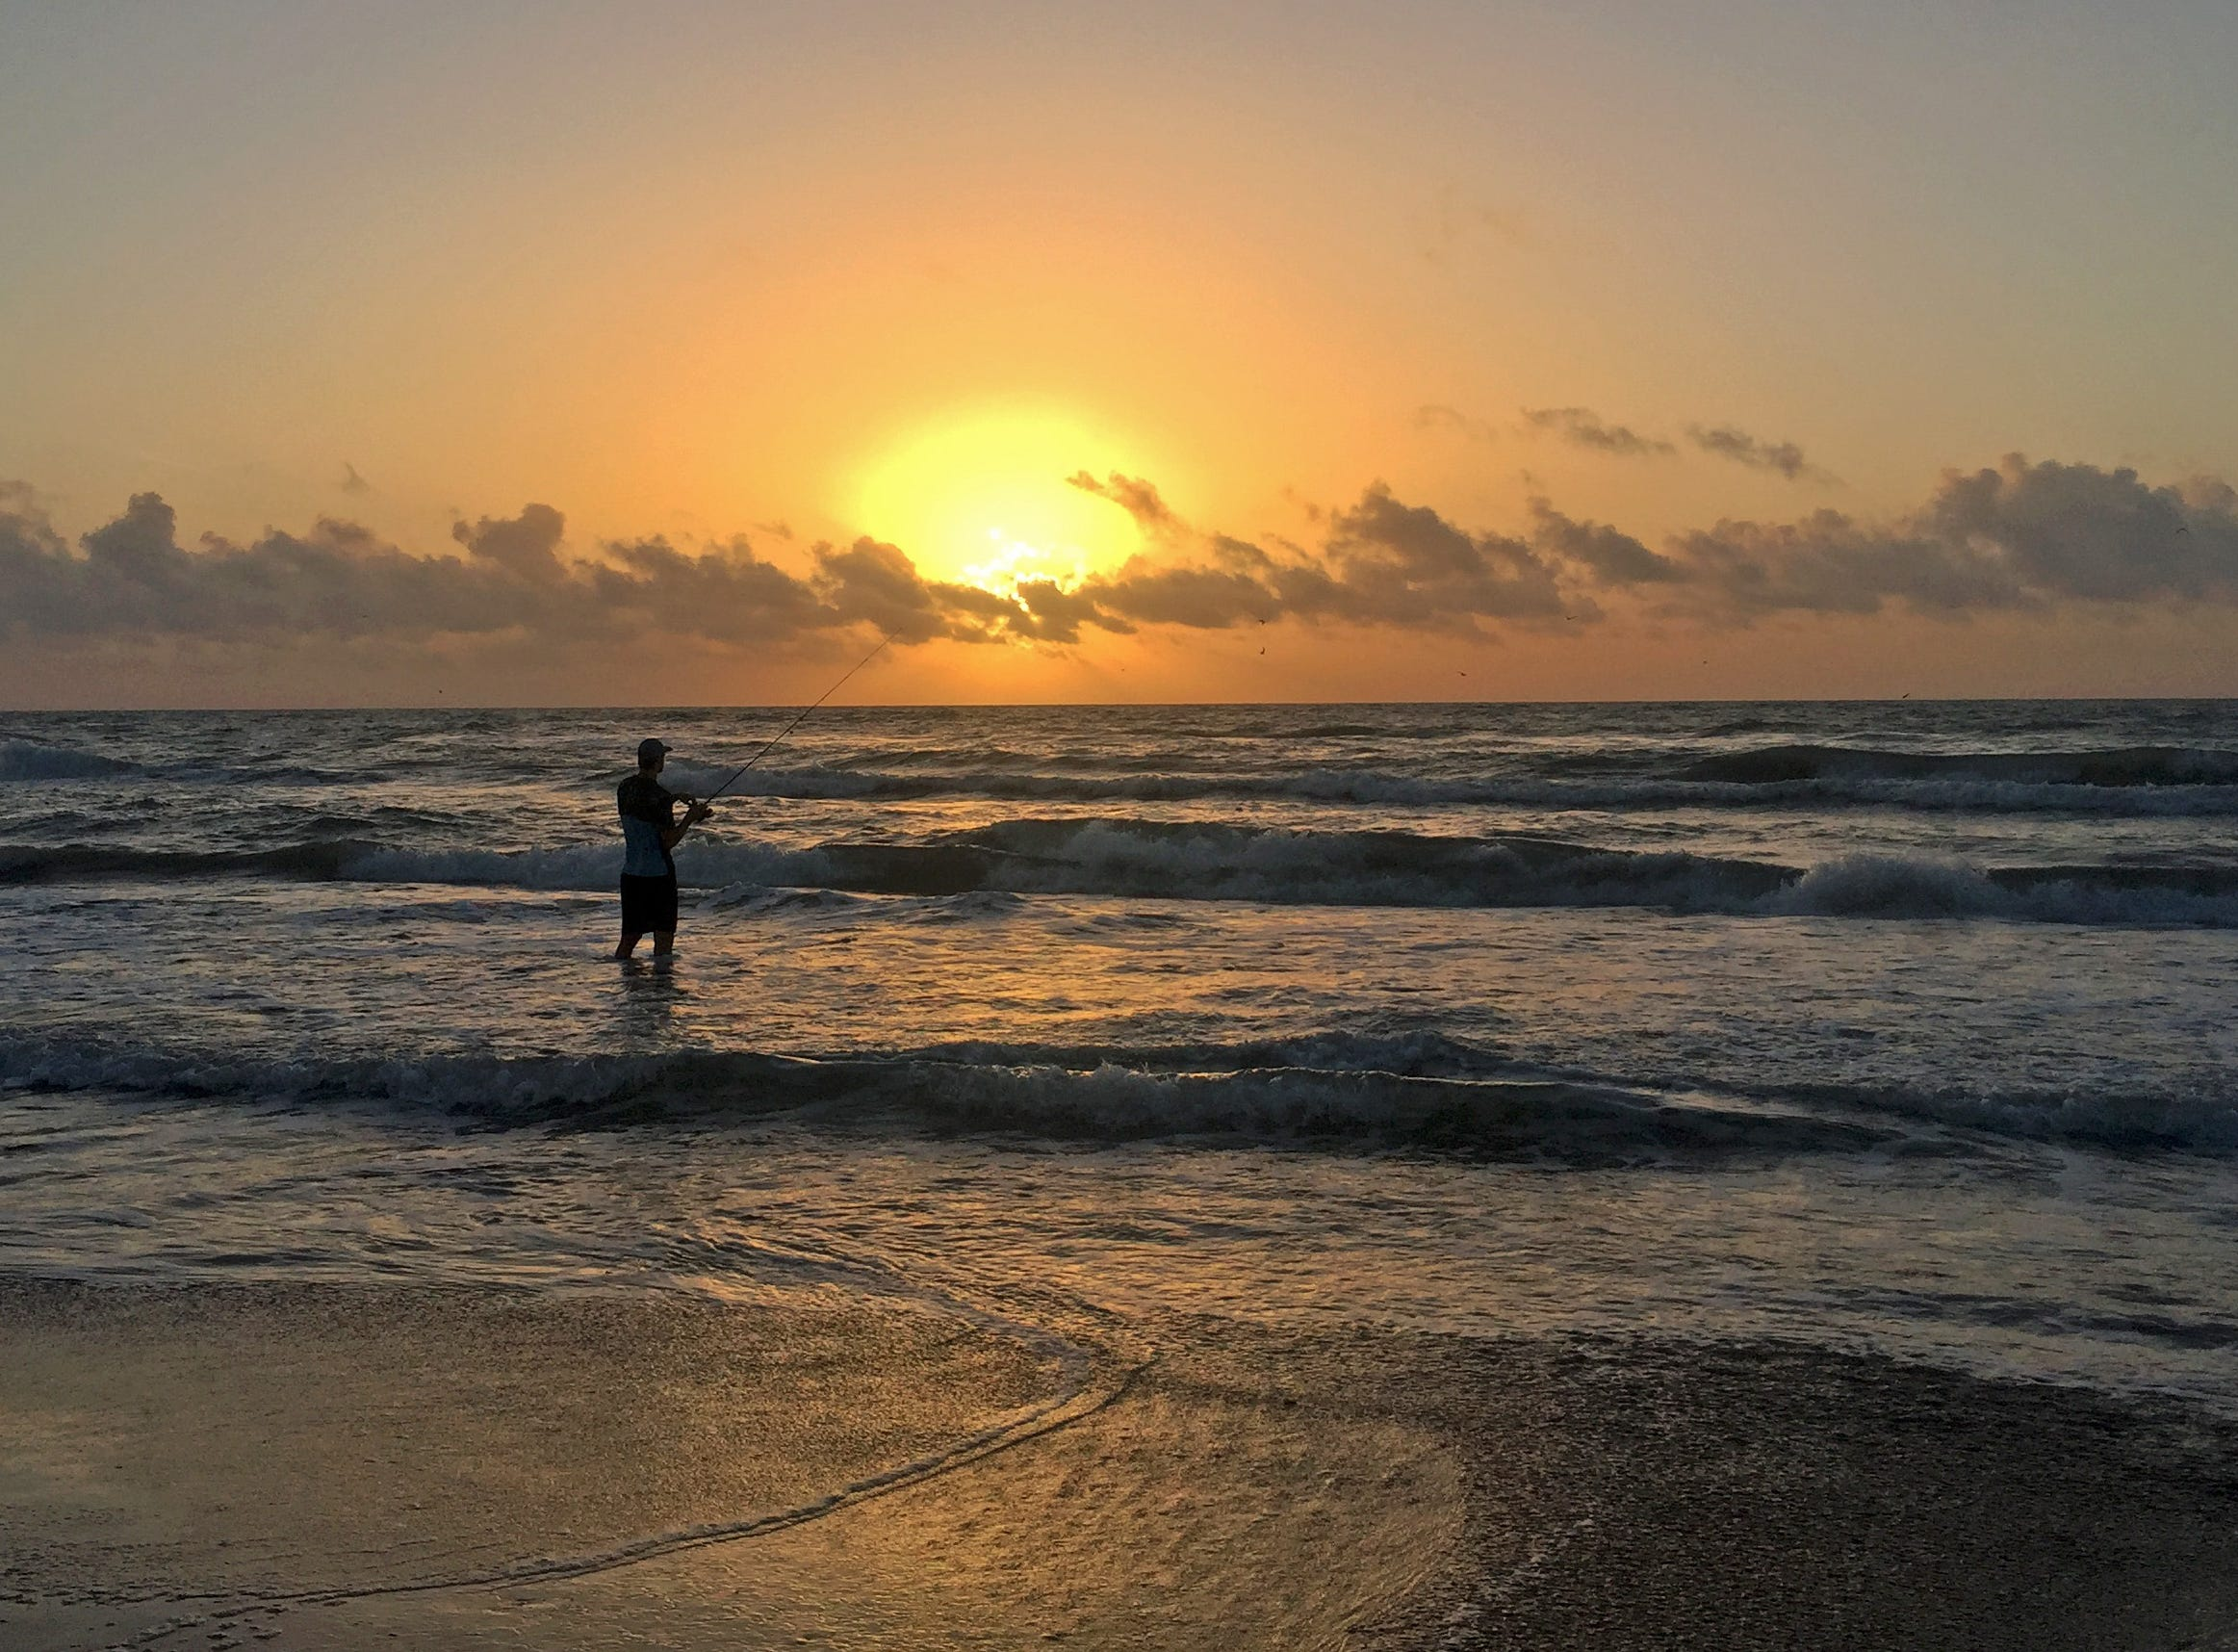 Luke McGhee enjoys a sunrise wade on Padre Island National Seashore.